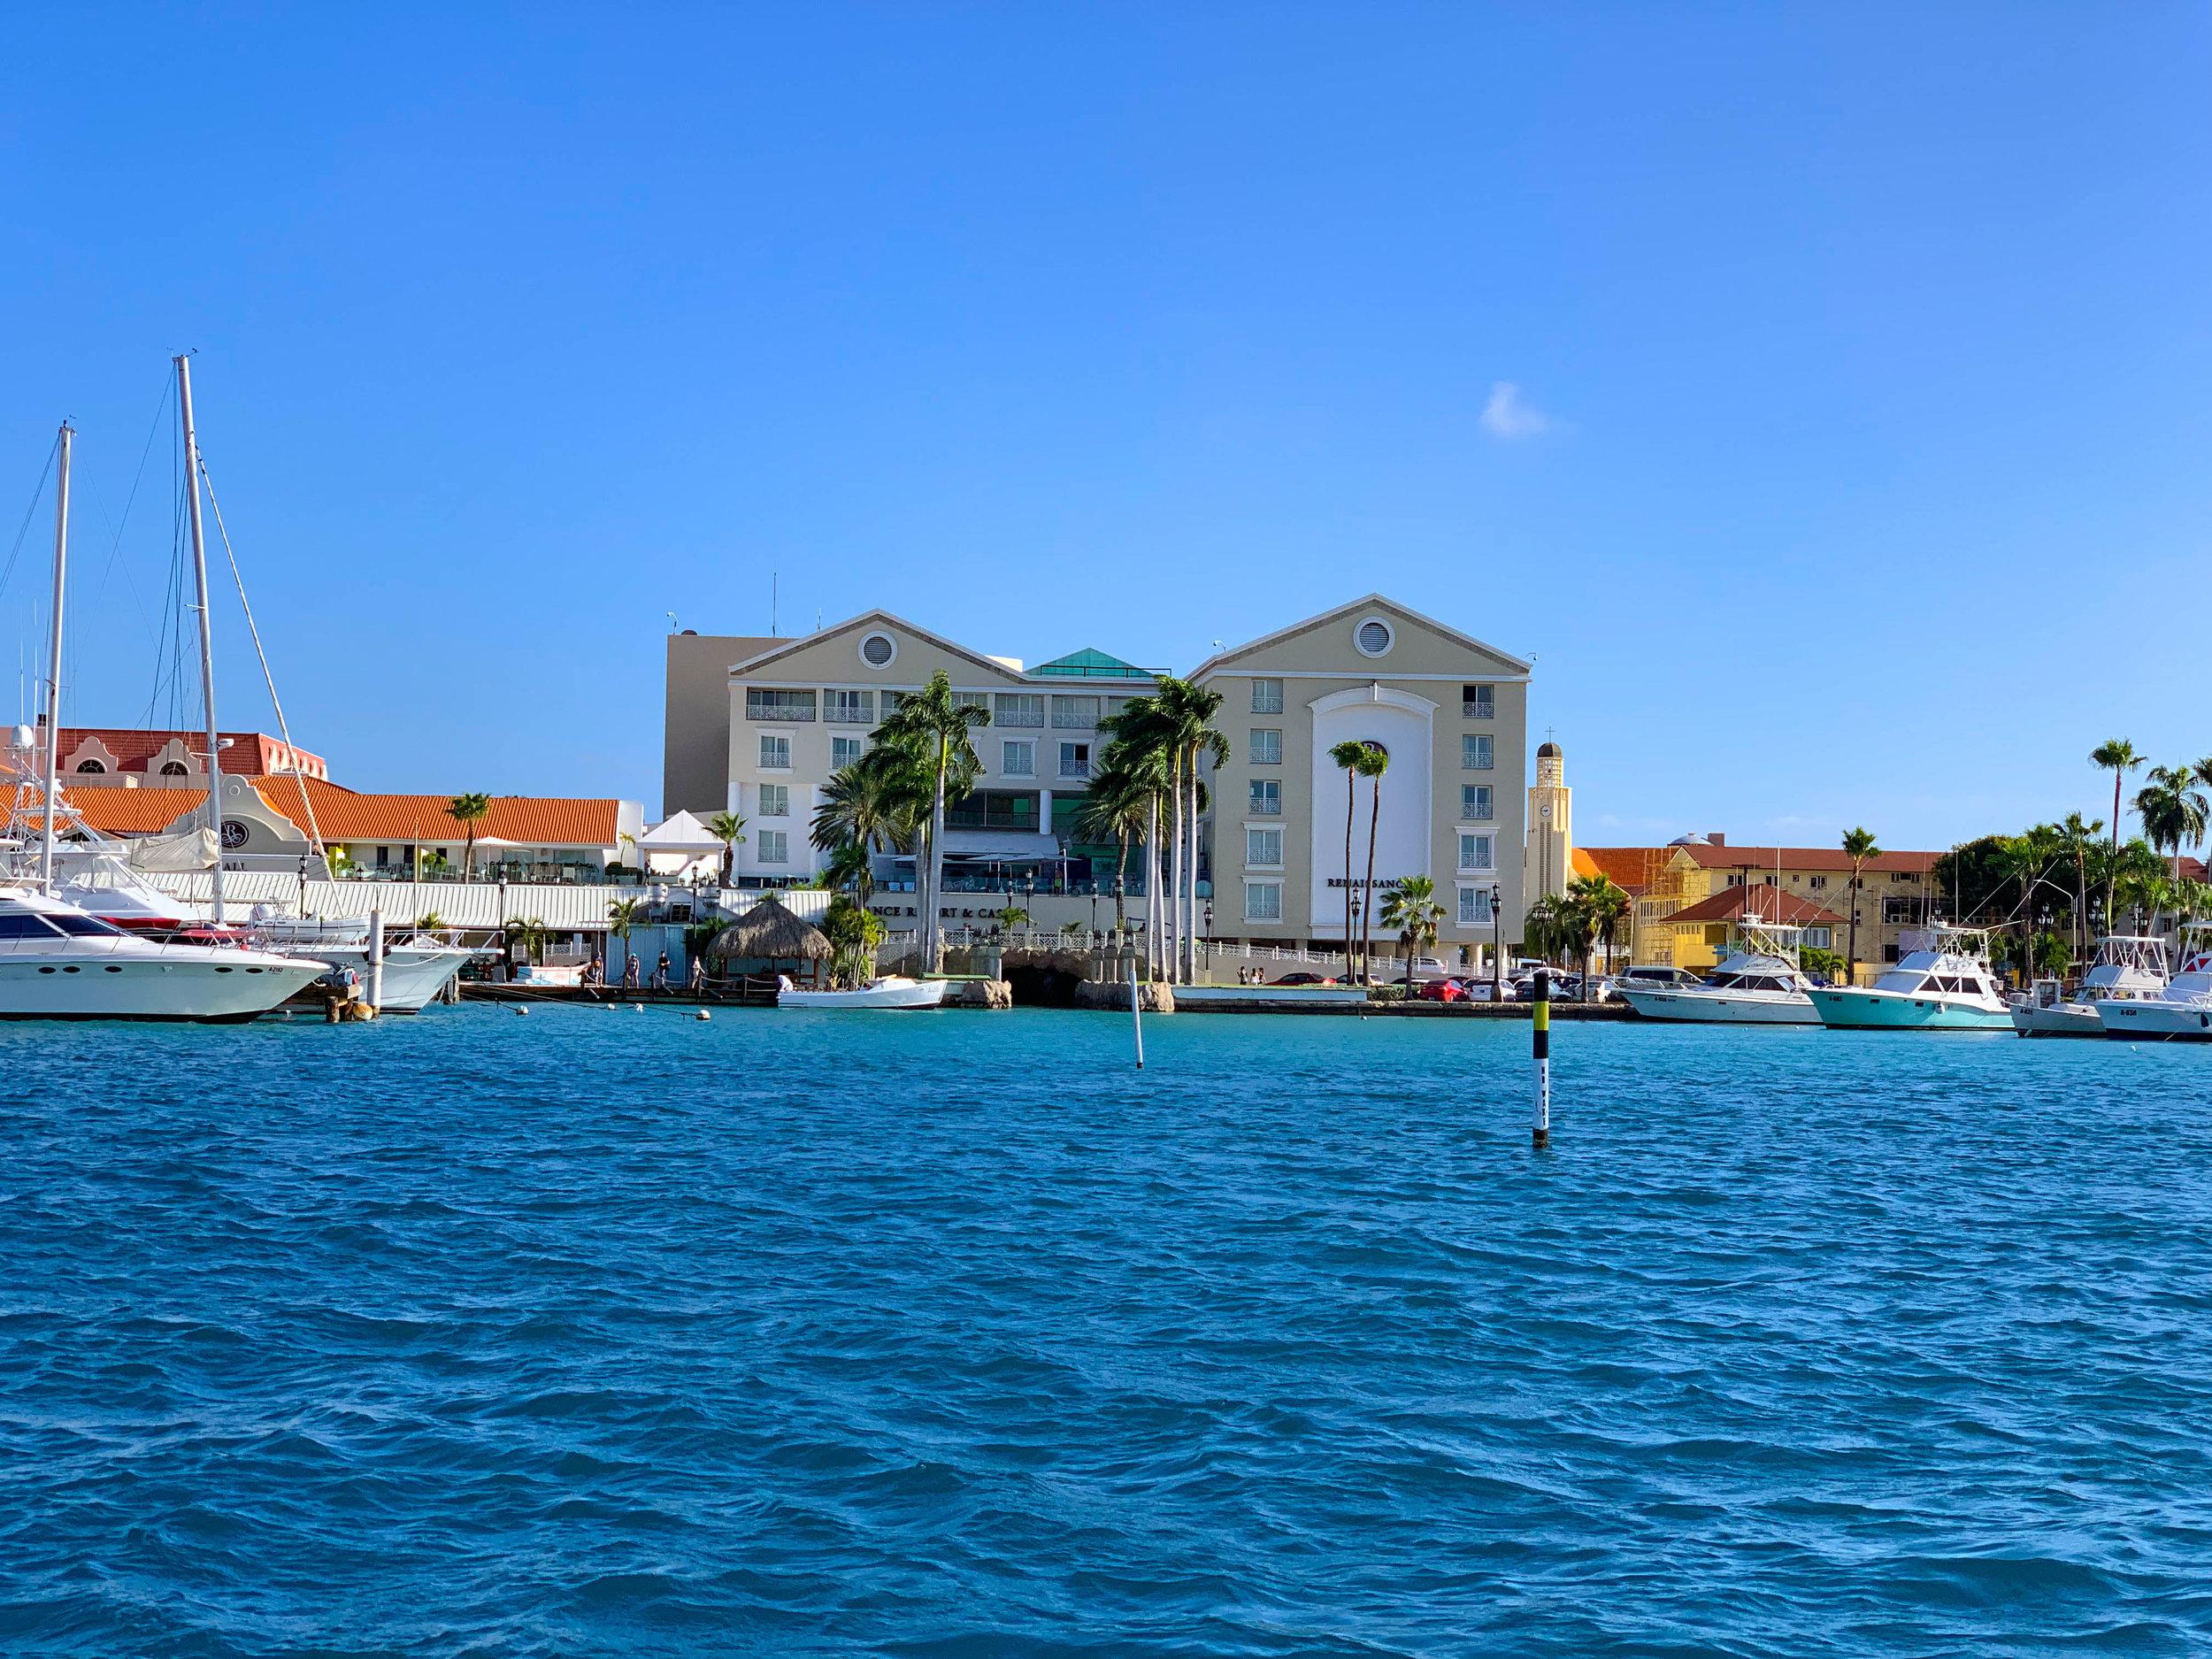 Renaissance_Aruba_Resort.jpg